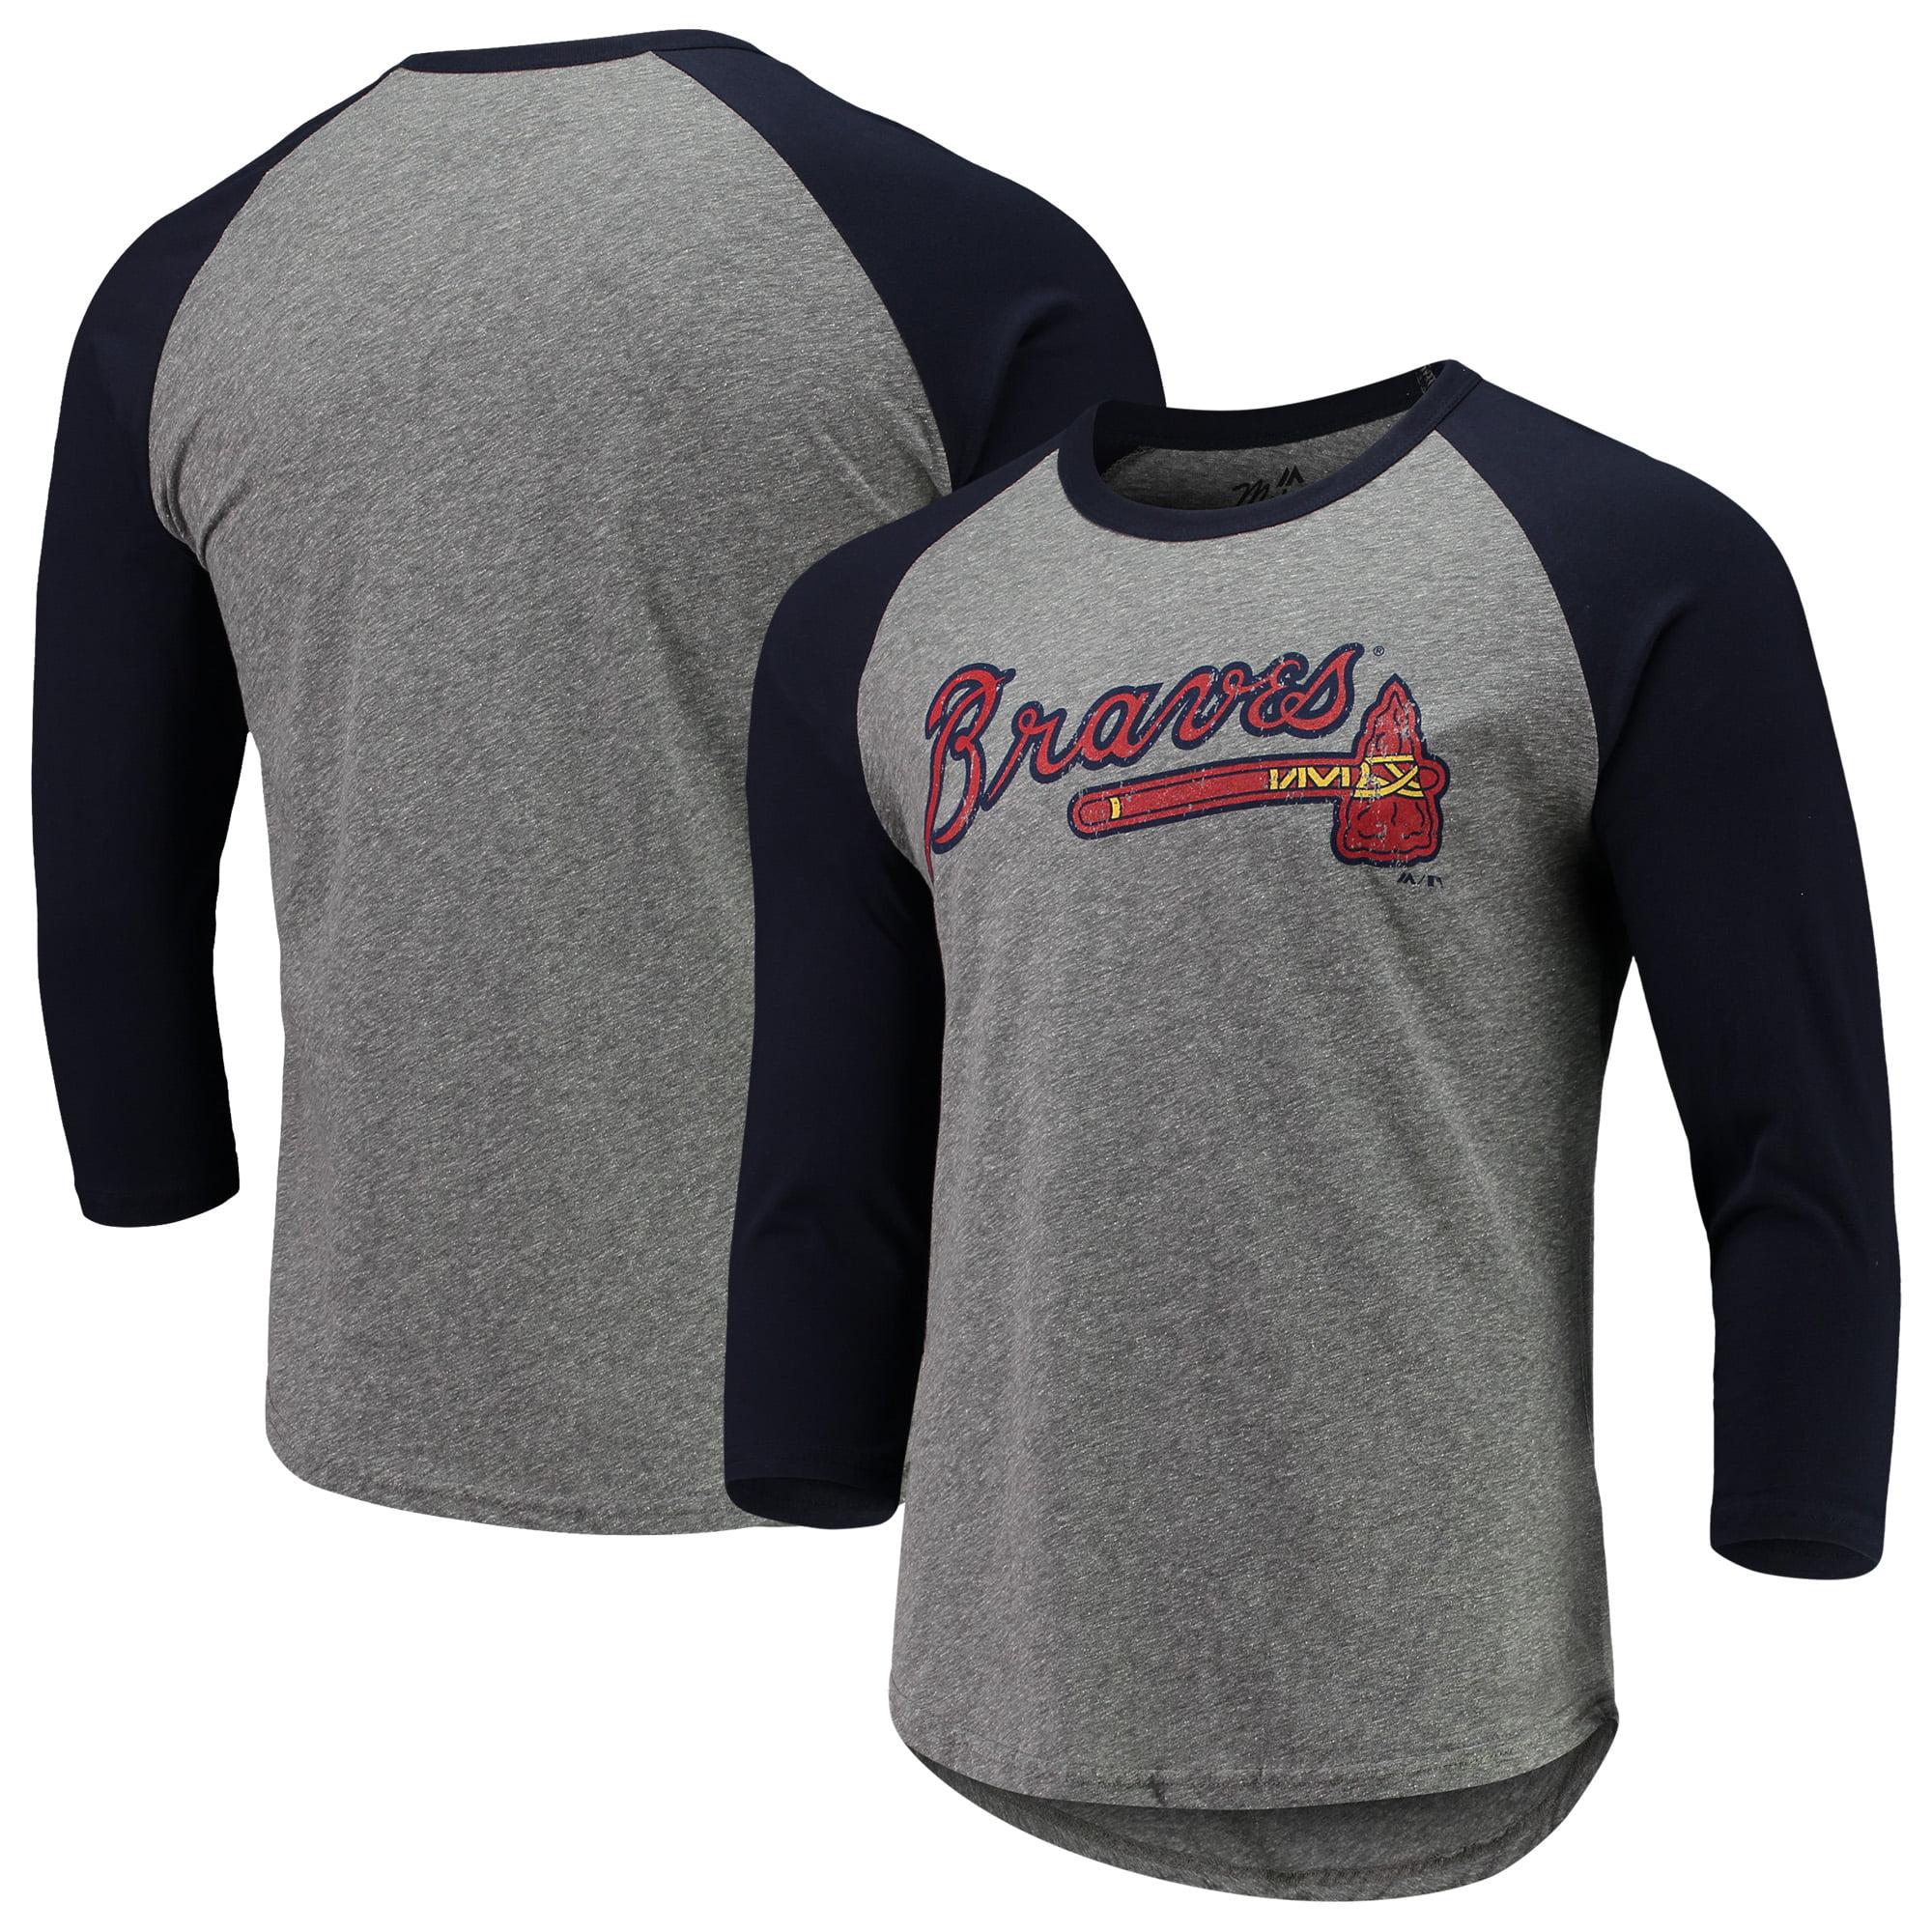 Atlanta Braves Majestic Threads Current Logo 3/4-Sleeve Raglan Tri-Blend T-Shirt - Heathered Gray/Navy